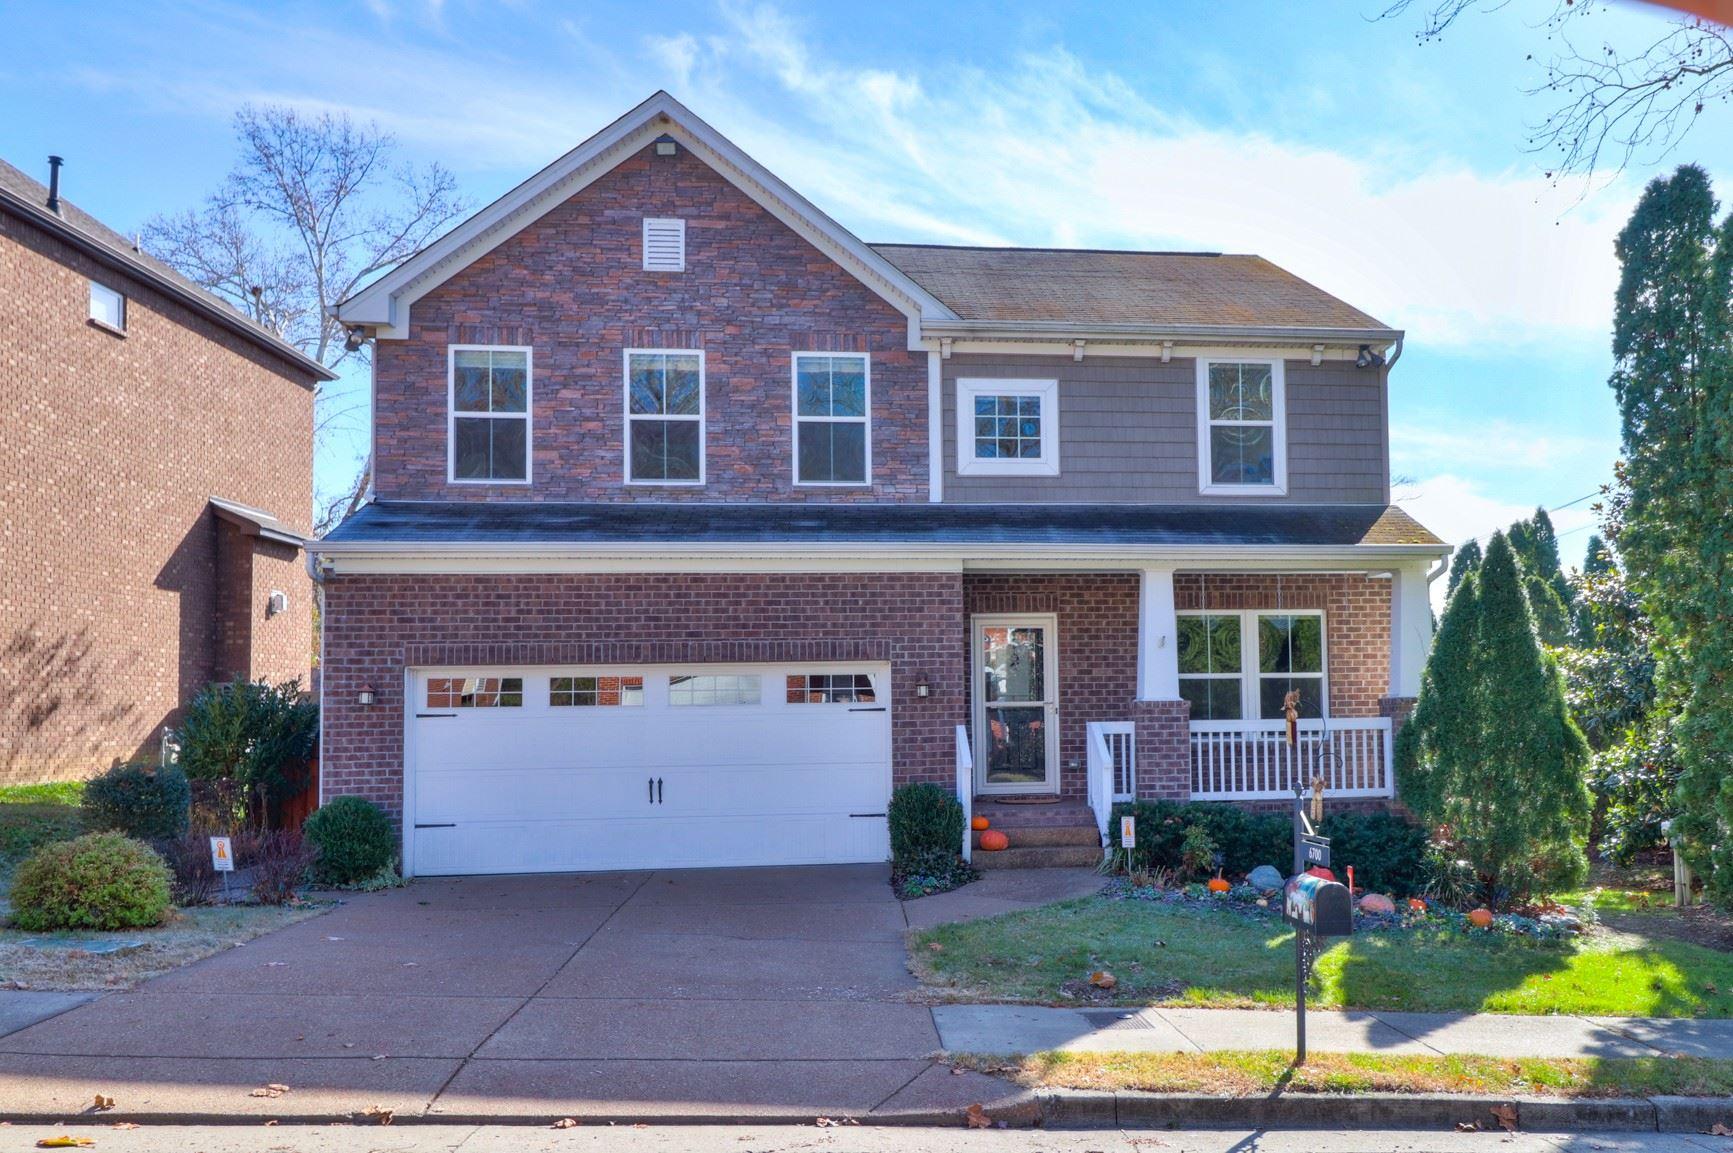 6700 Autumn Oaks Dr, Brentwood, TN 37027 - MLS#: 2211575